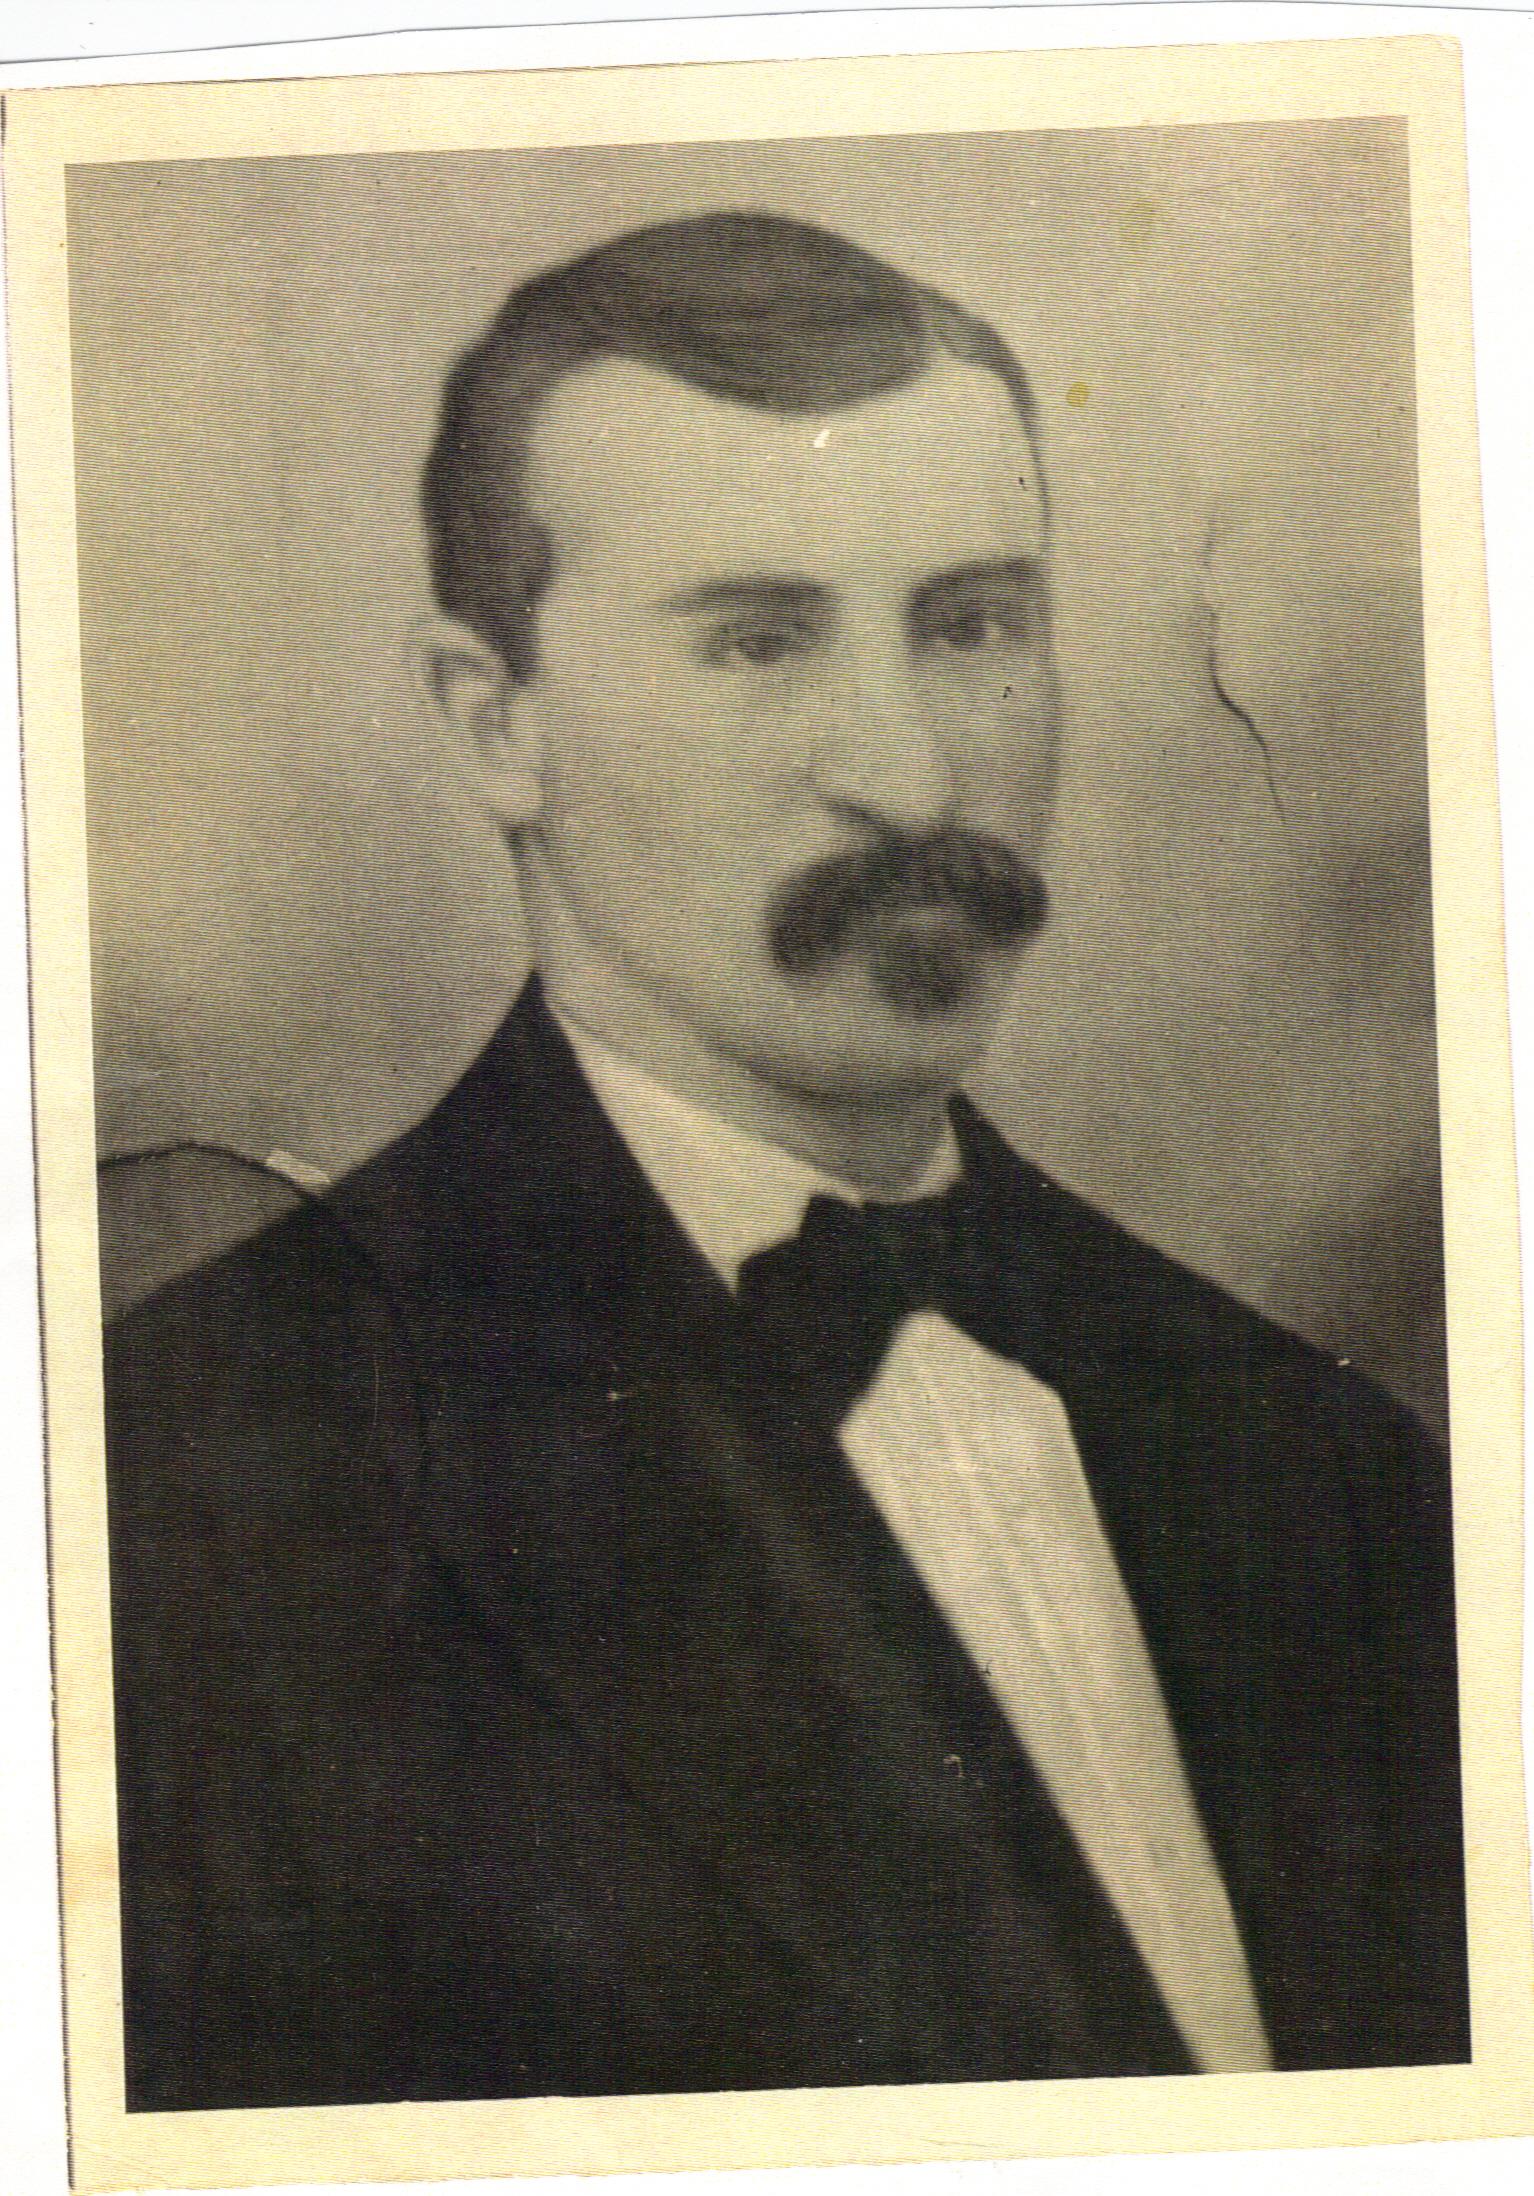 Martin Stanley Mccay